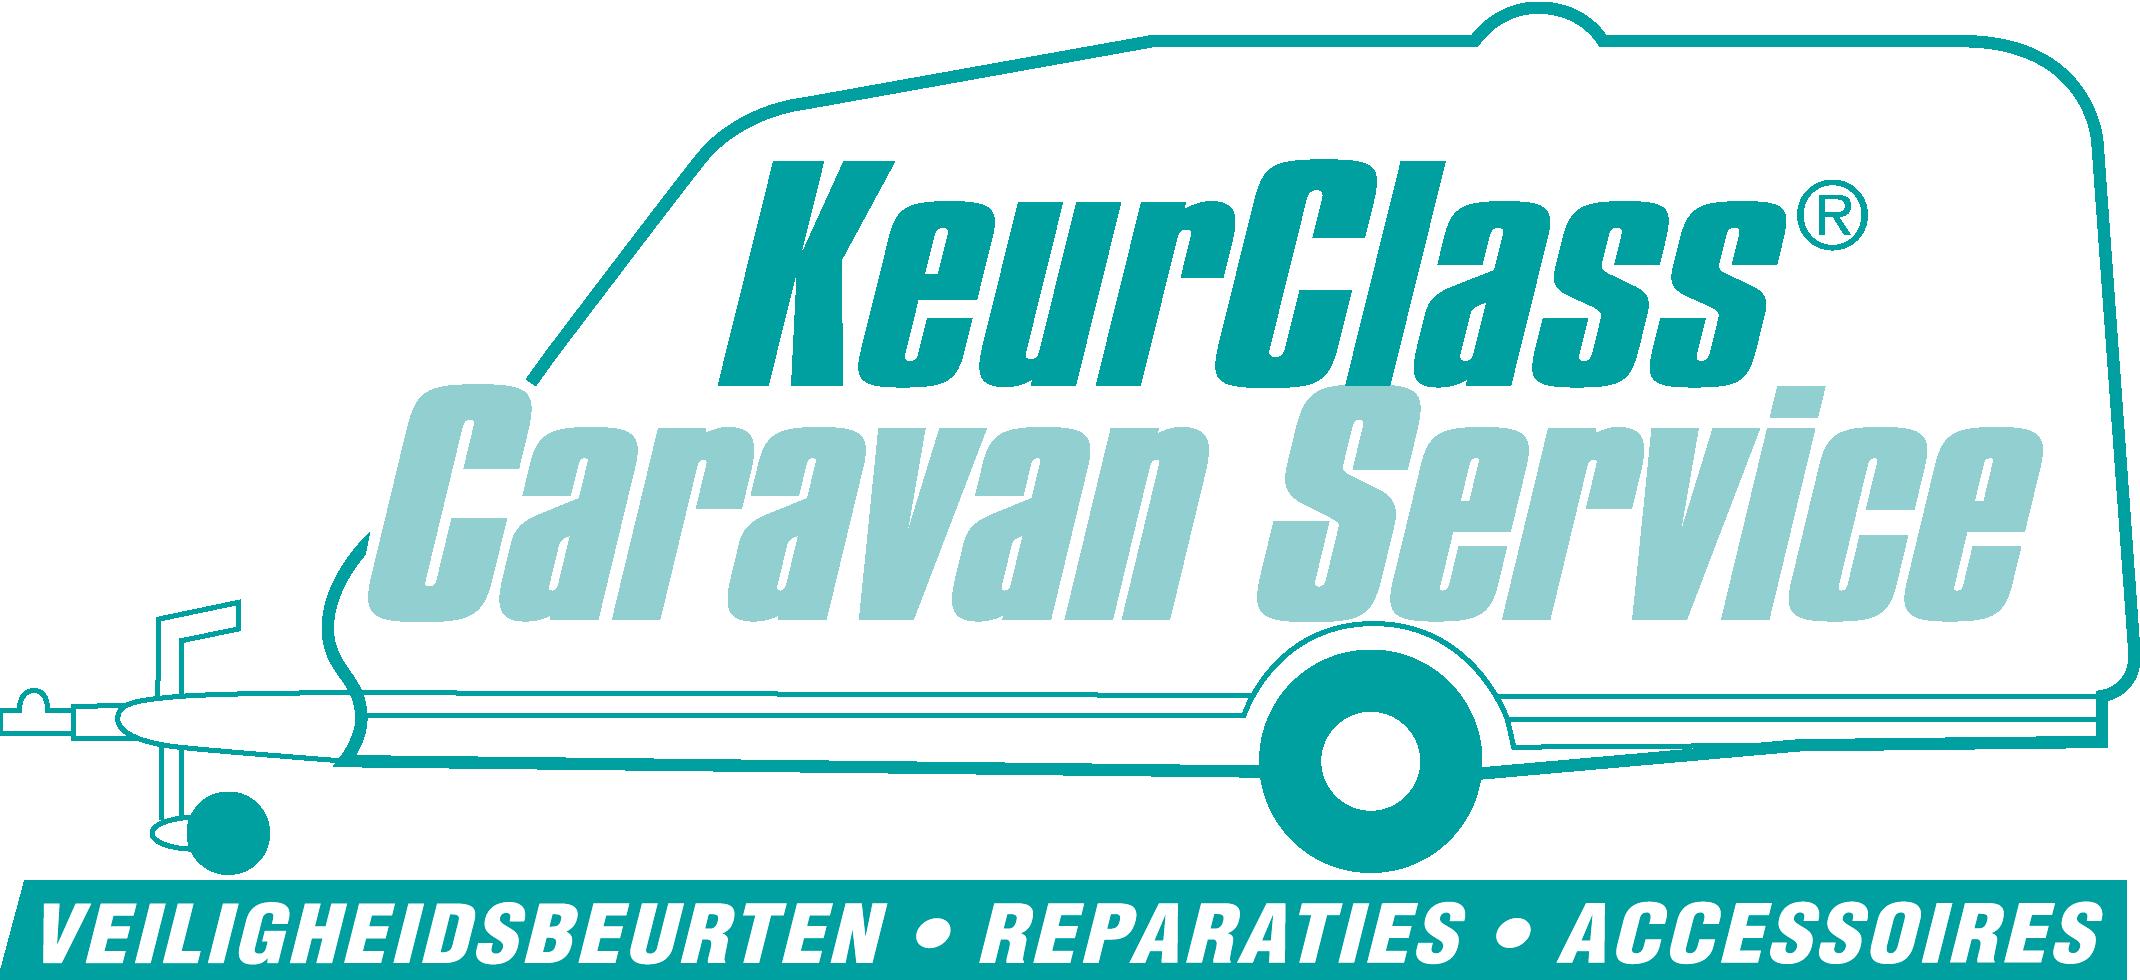 KeurClass Caravans